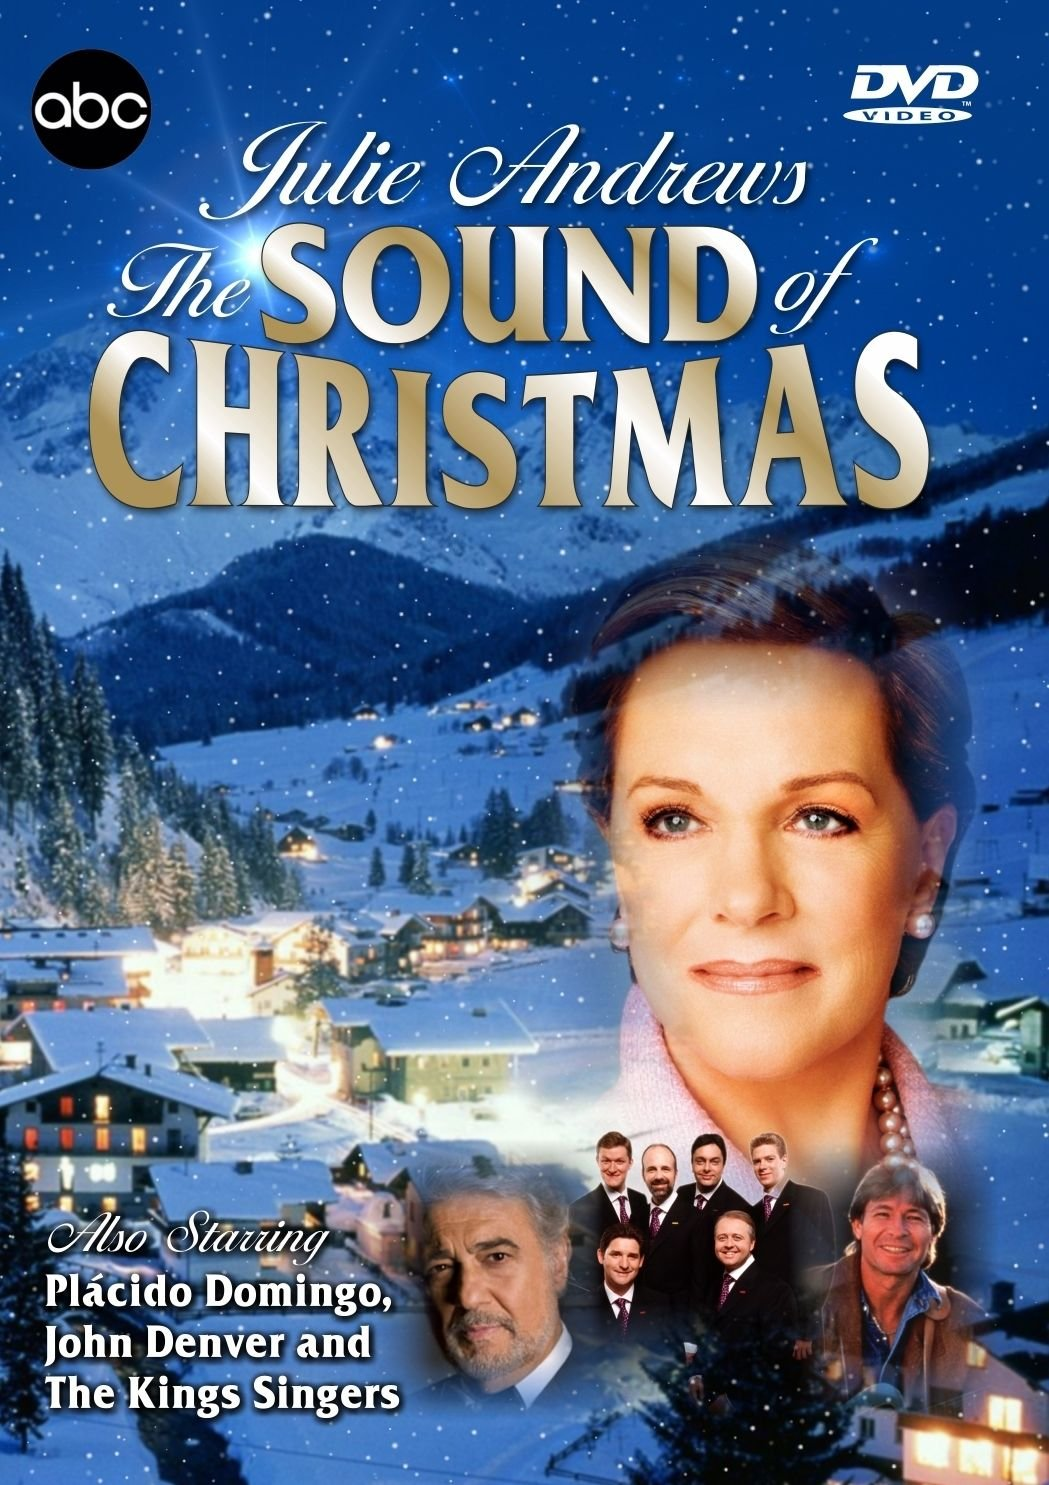 Julie Andrews: The Sound of Christmas (TV Movie 1987) - IMDb